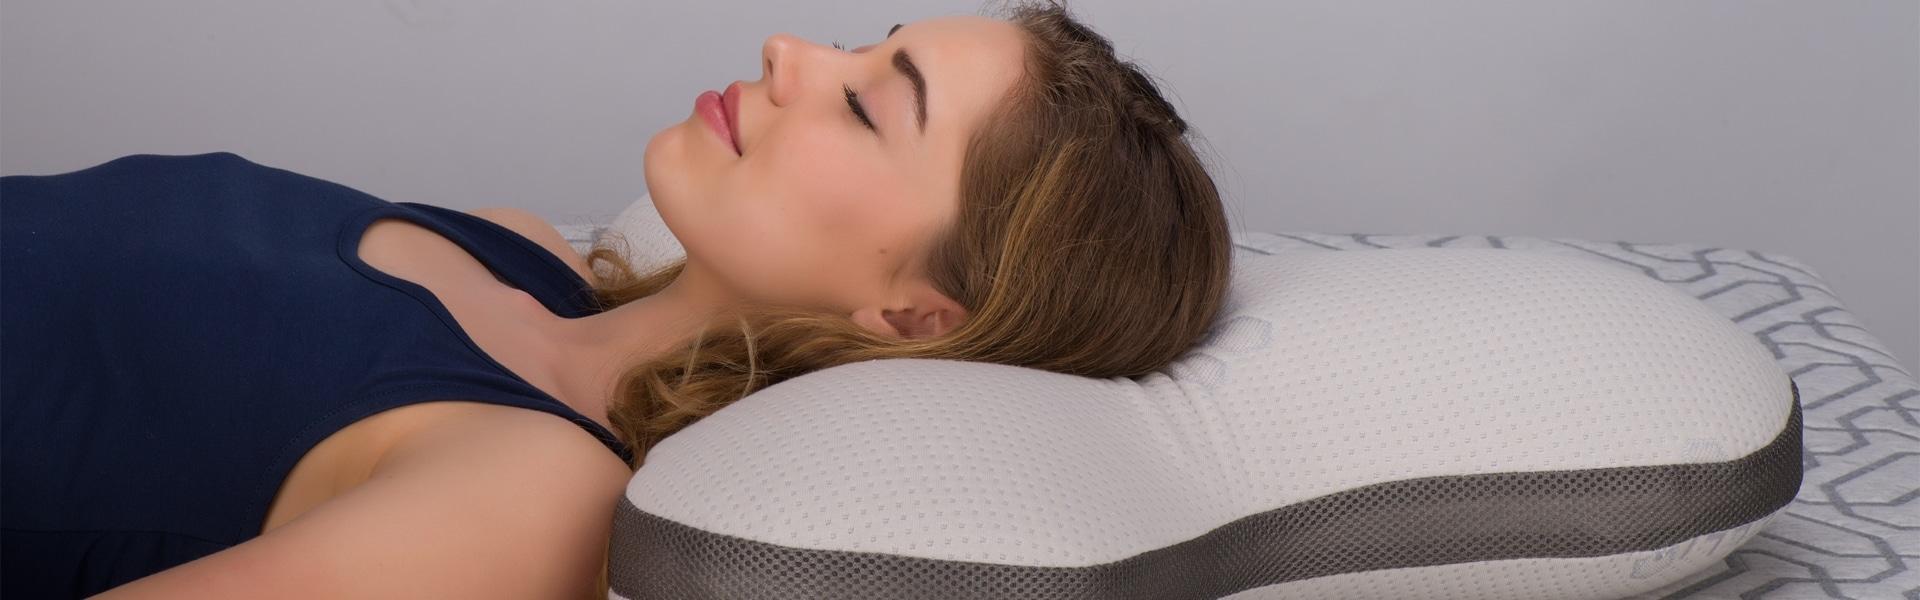 Best Pillows for Sleep Apnea Reviewed in Detail